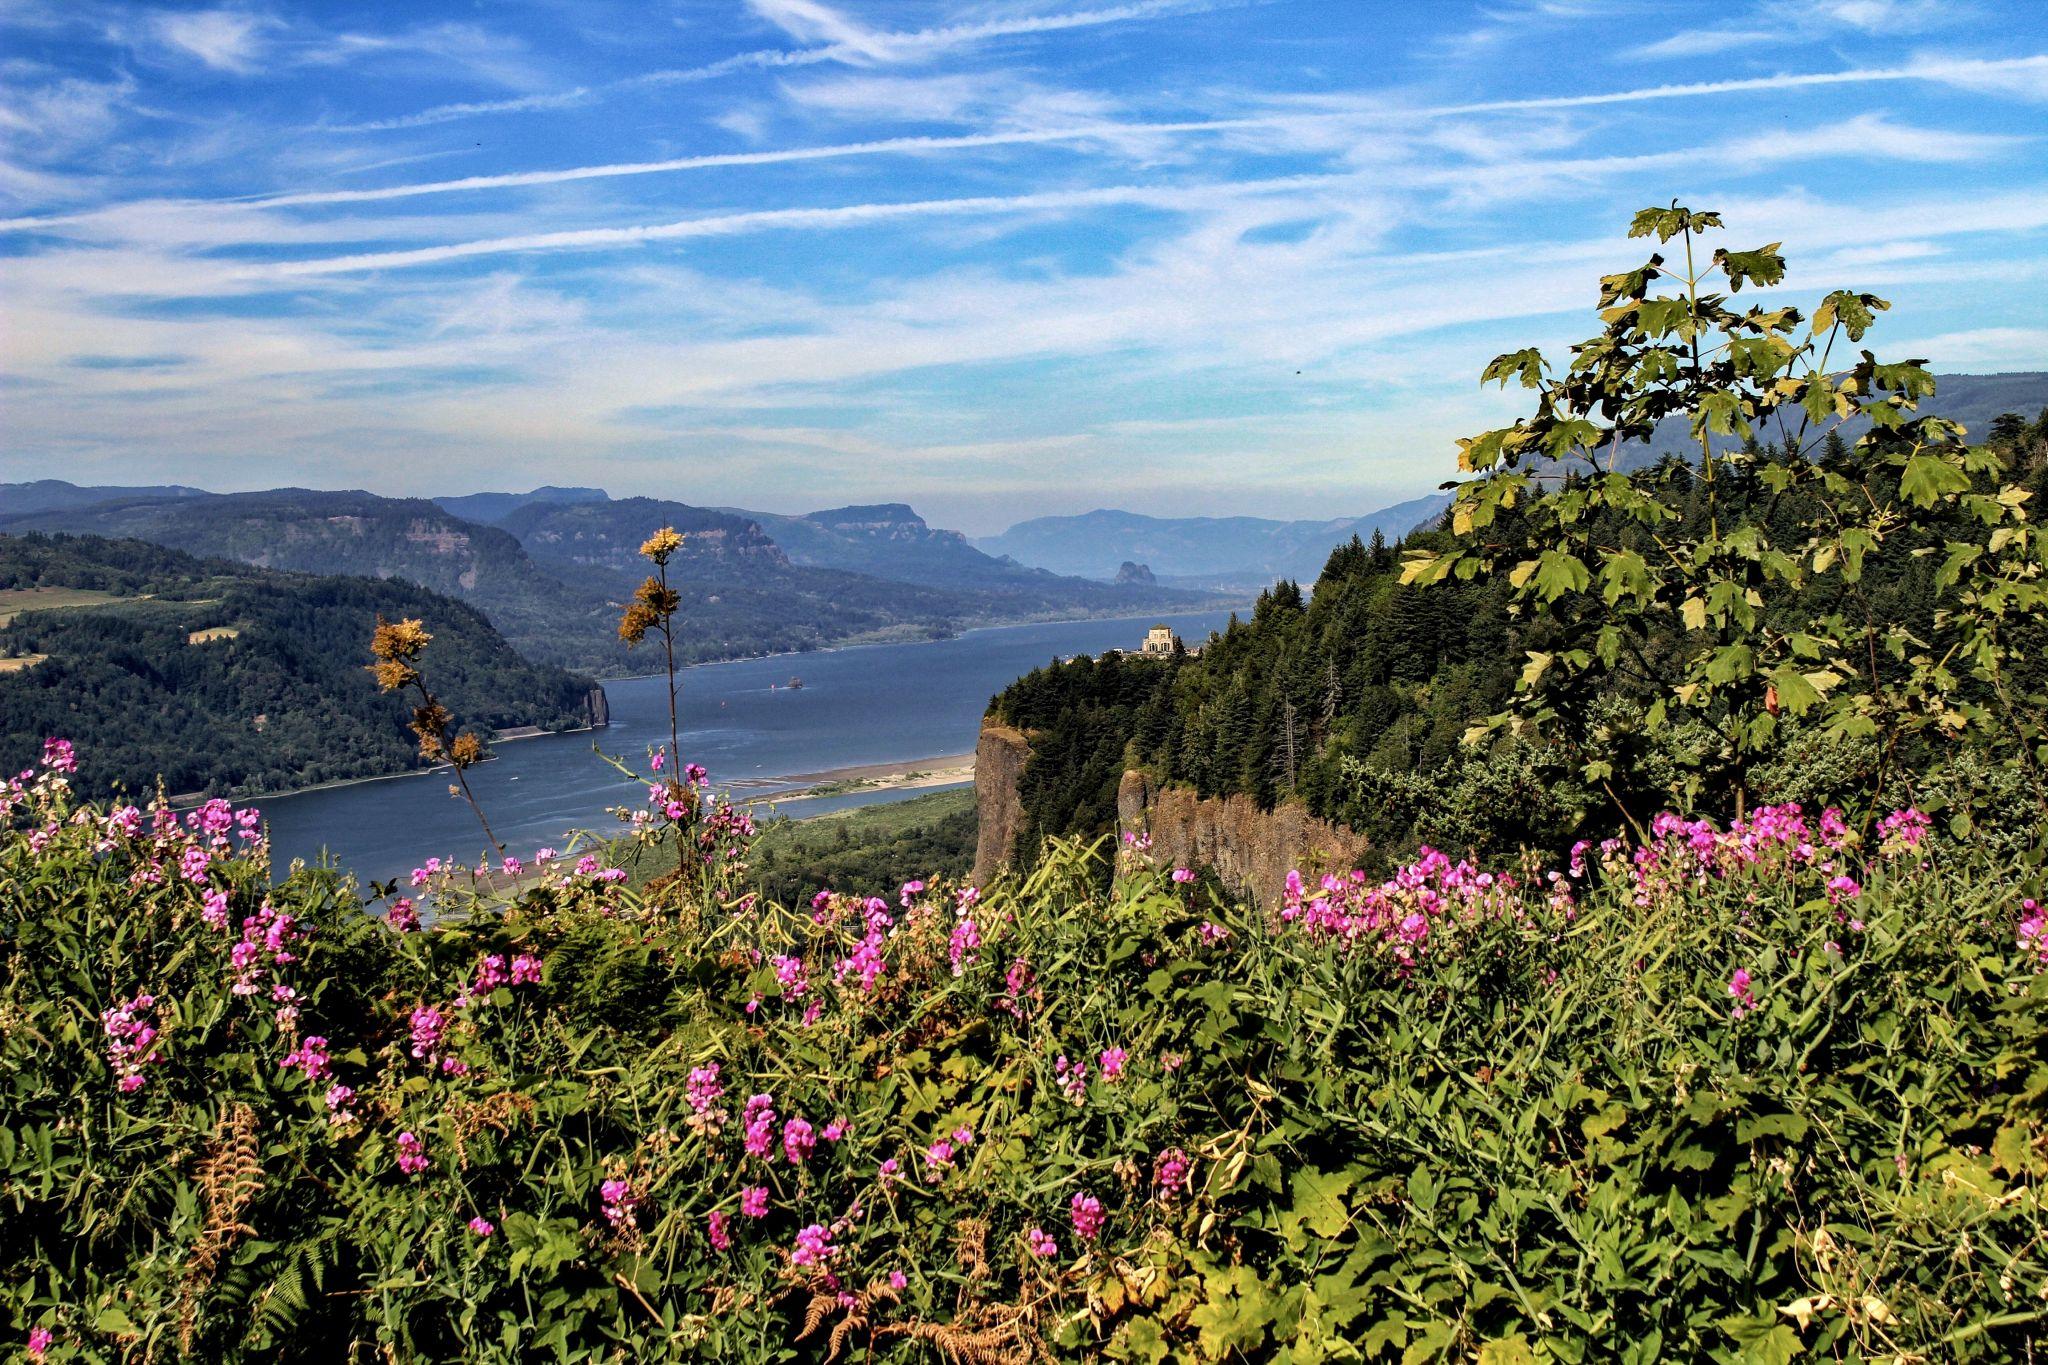 Portland Women's Forum Scenic Viewpoint, USA